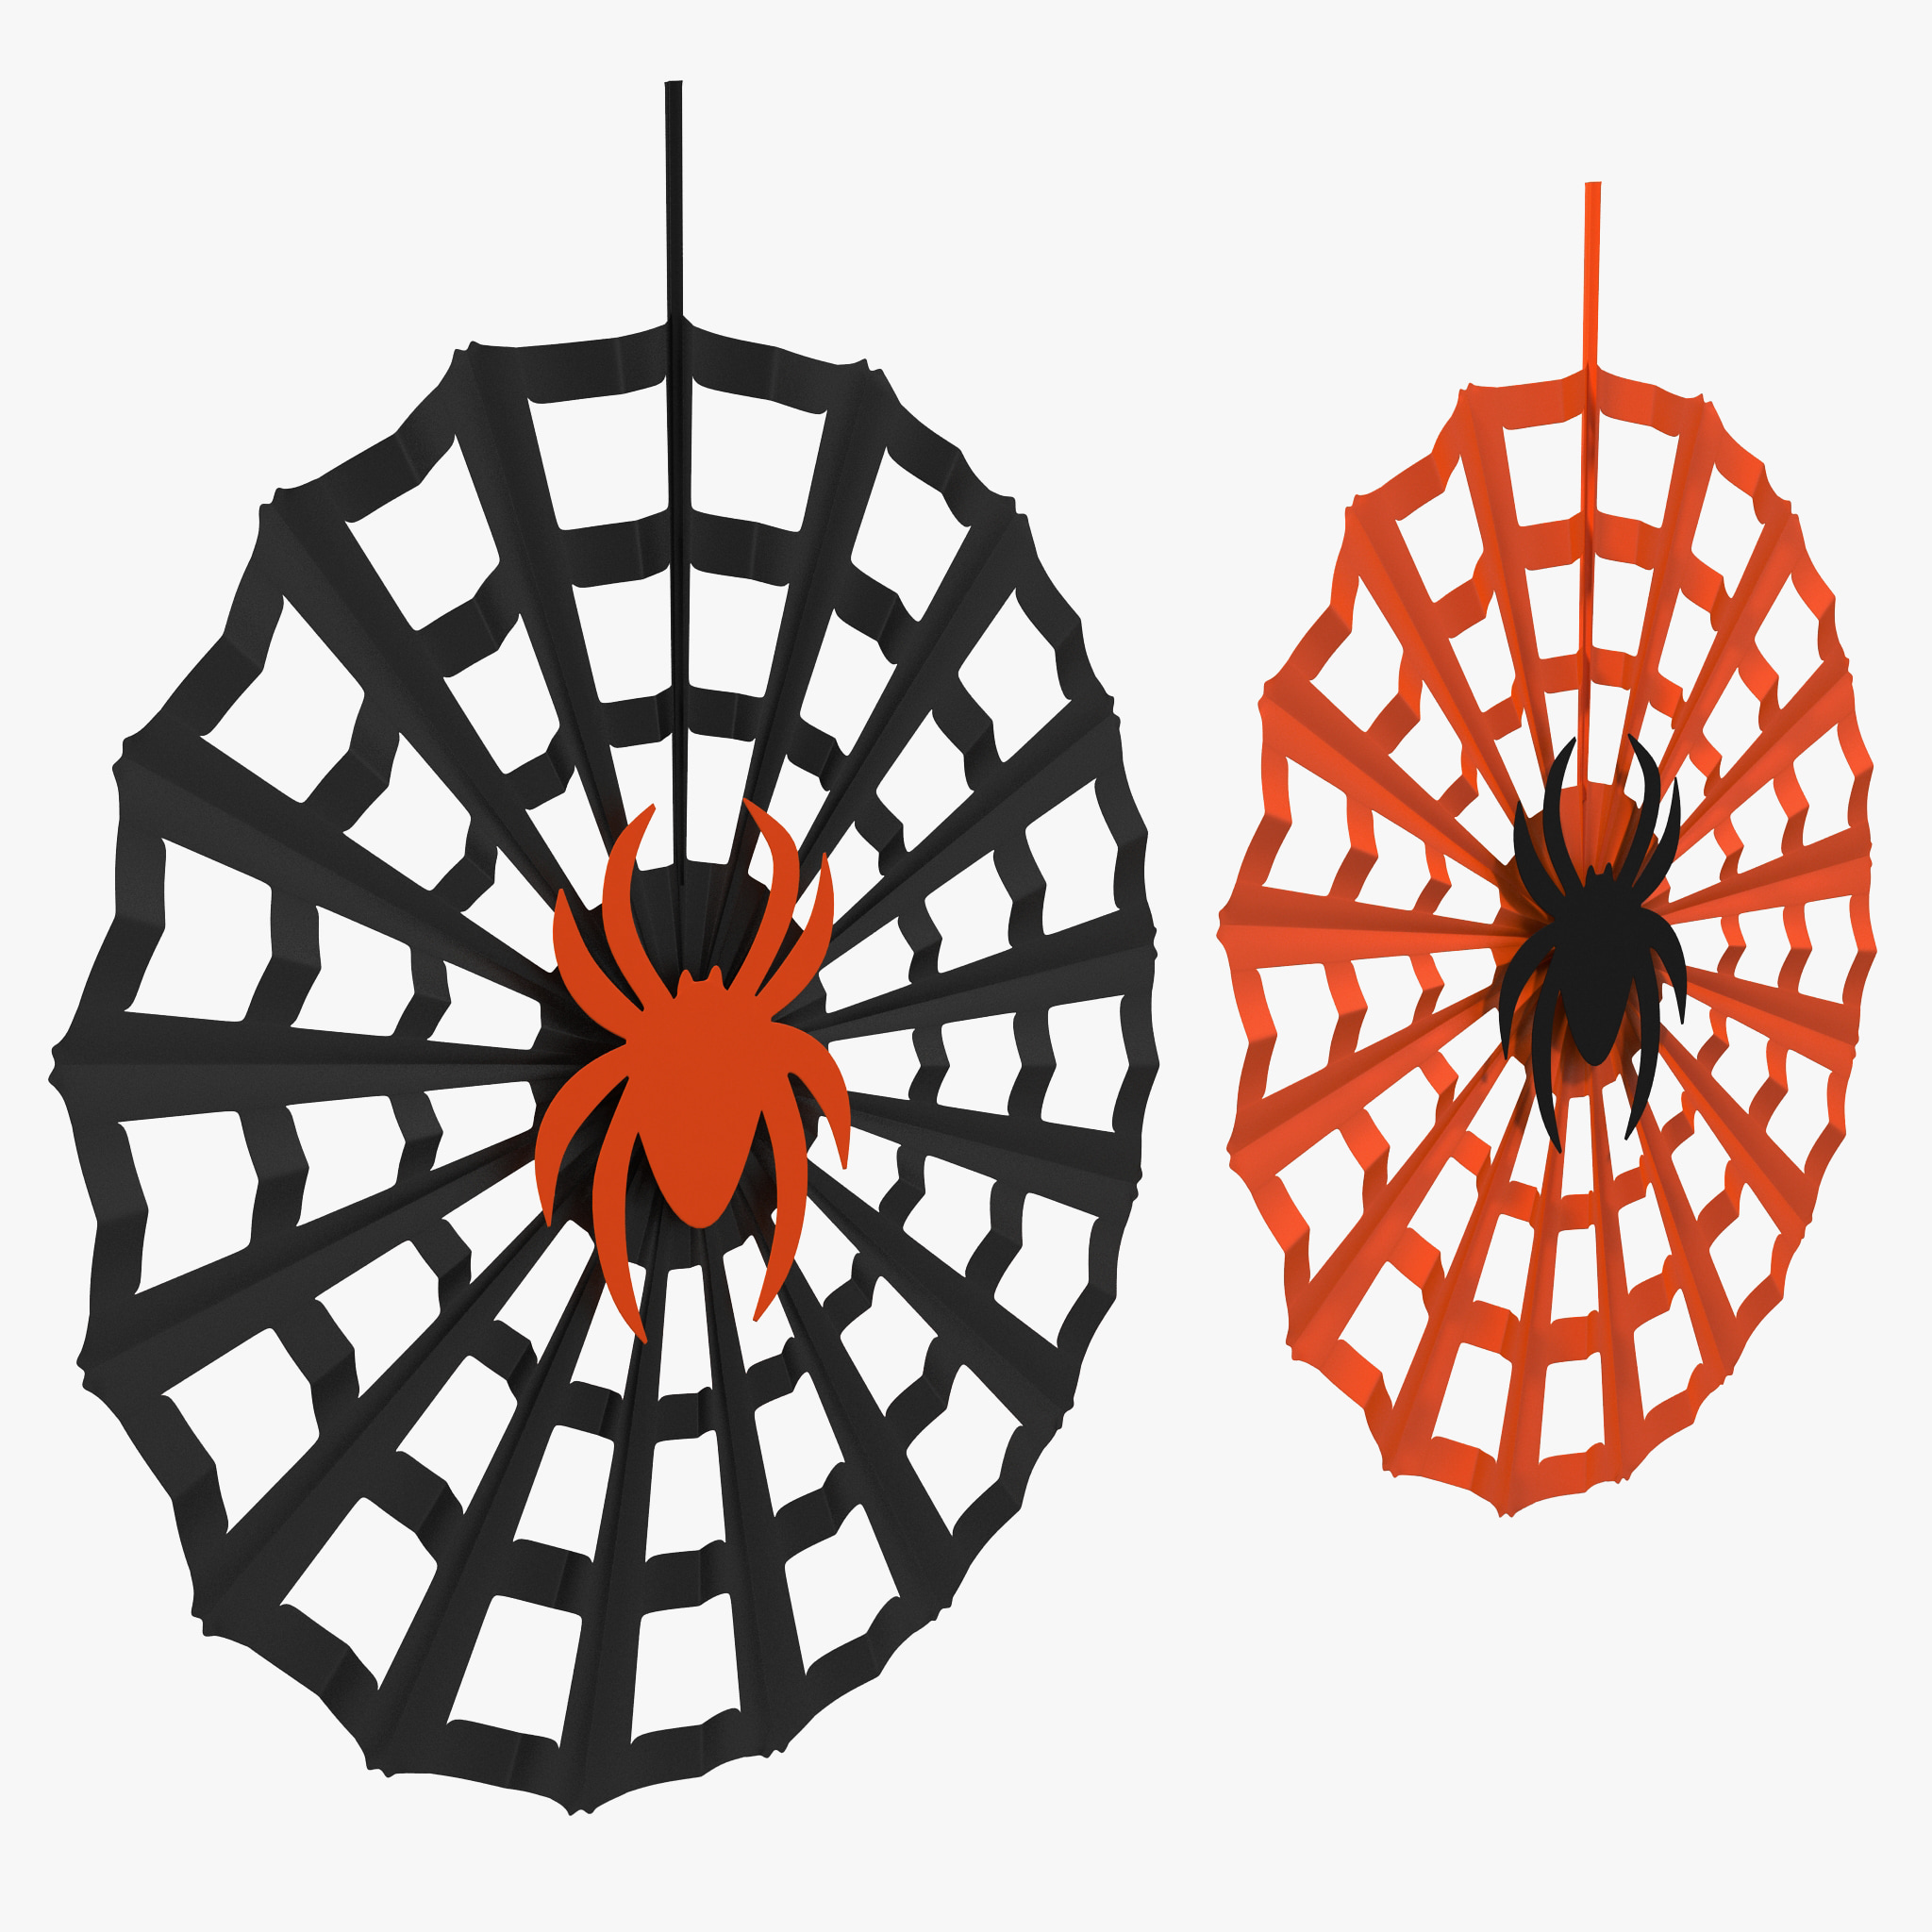 spiderweb decoration 3d model